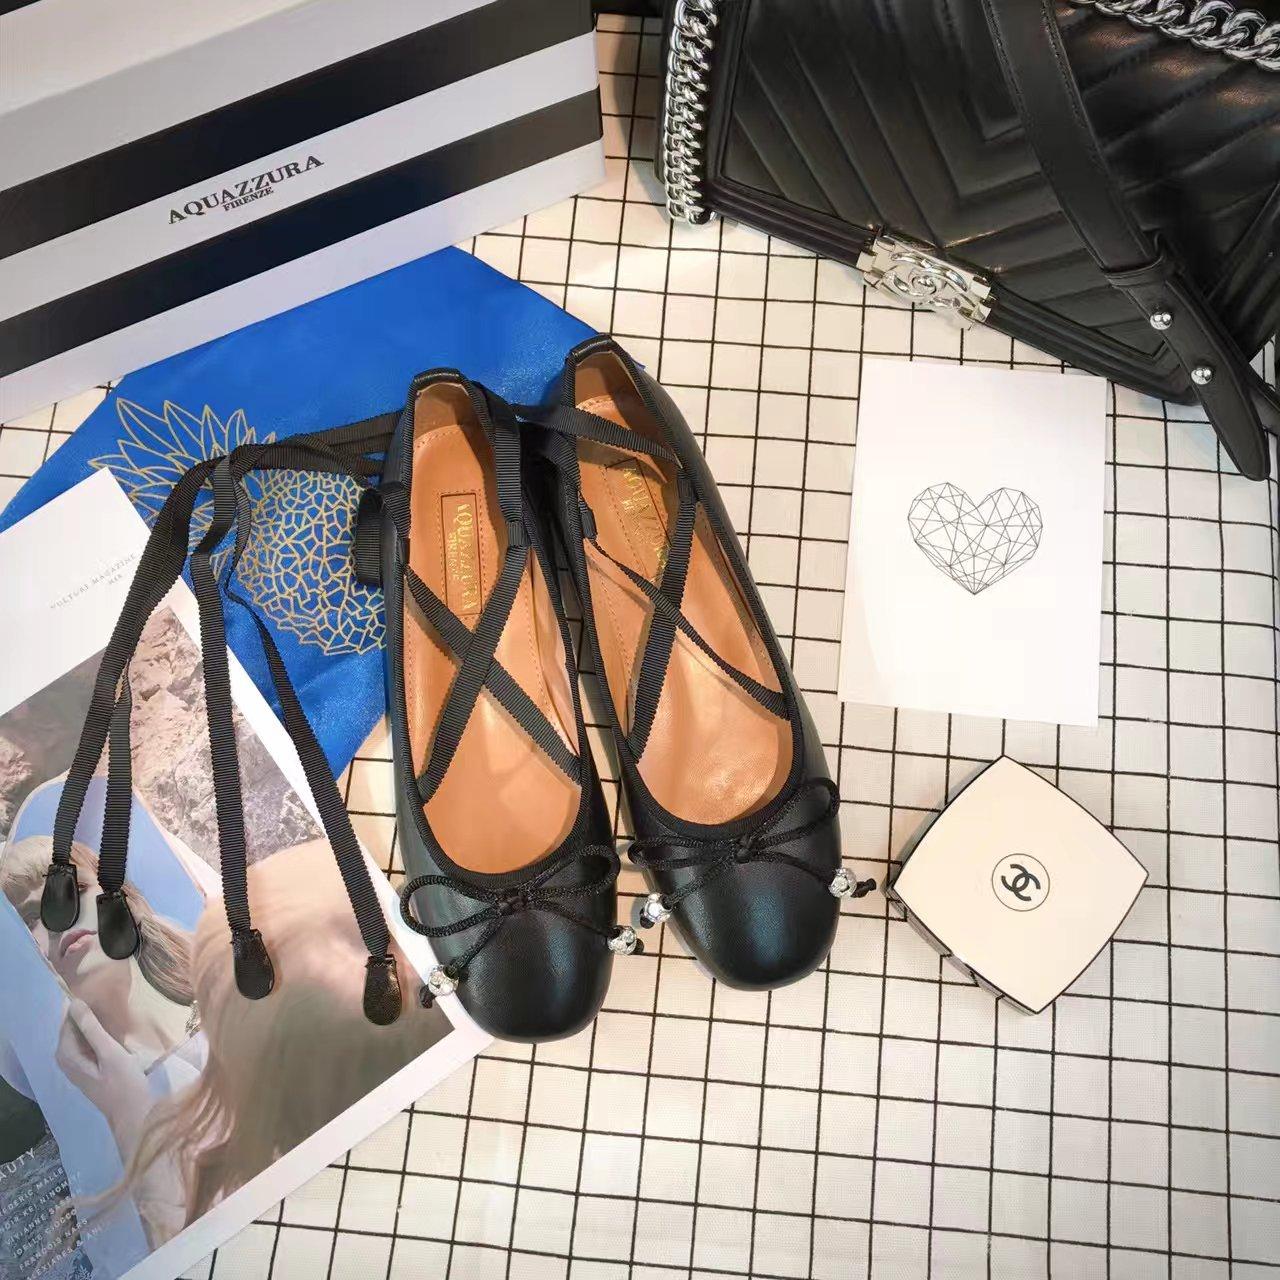 【AQUAZZURA单鞋】极致性感的小方头平底单鞋